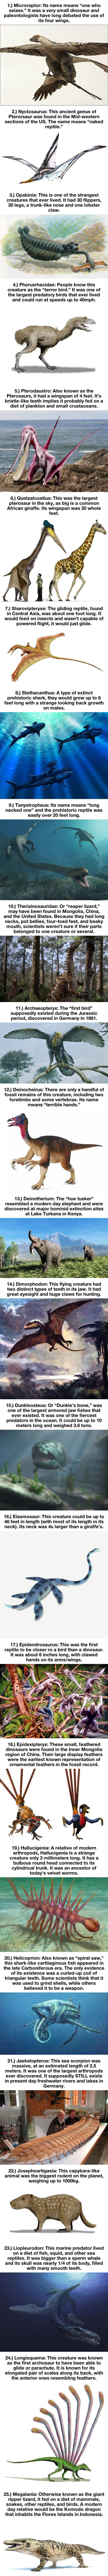 25 Weird Prehistoric Animals